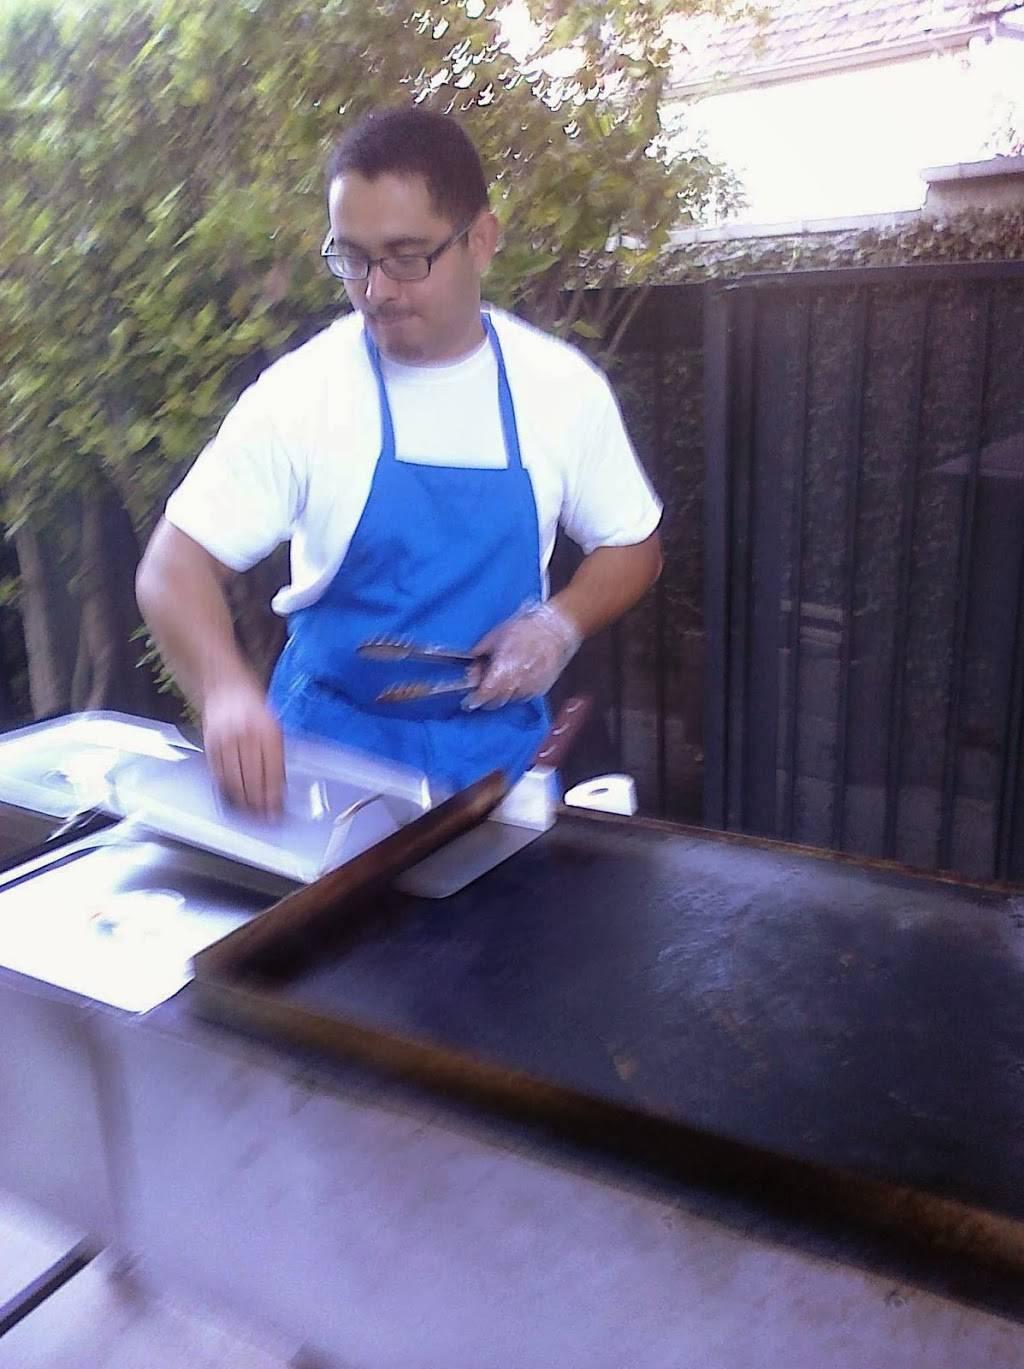 Tacos Guzman   restaurant   15480 Arrow Hwy, Baldwin Park, CA 91706, USA   6264075781 OR +1 626-407-5781